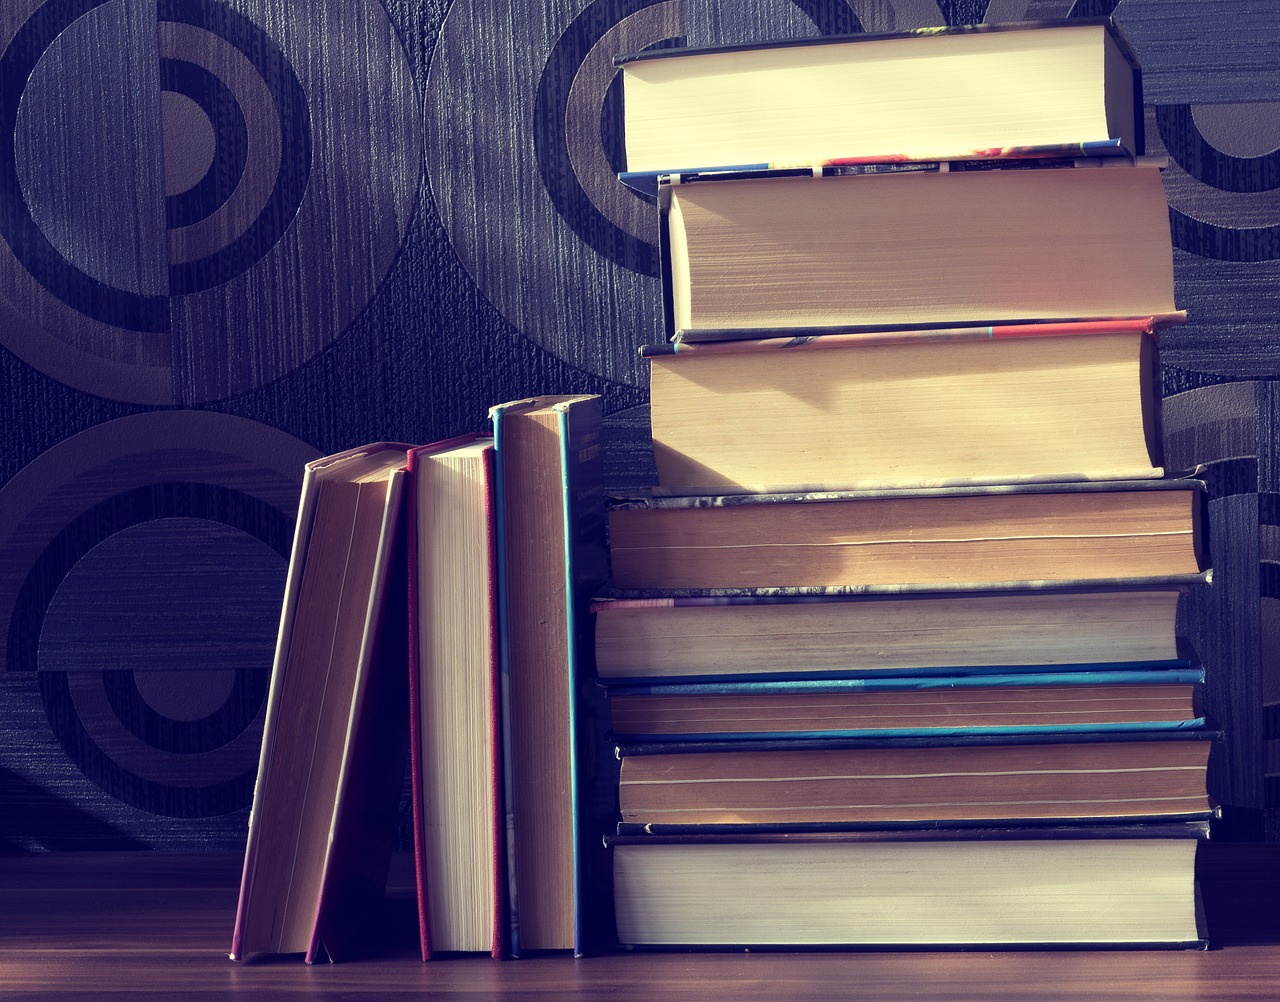 Books & Goodreads Challenge